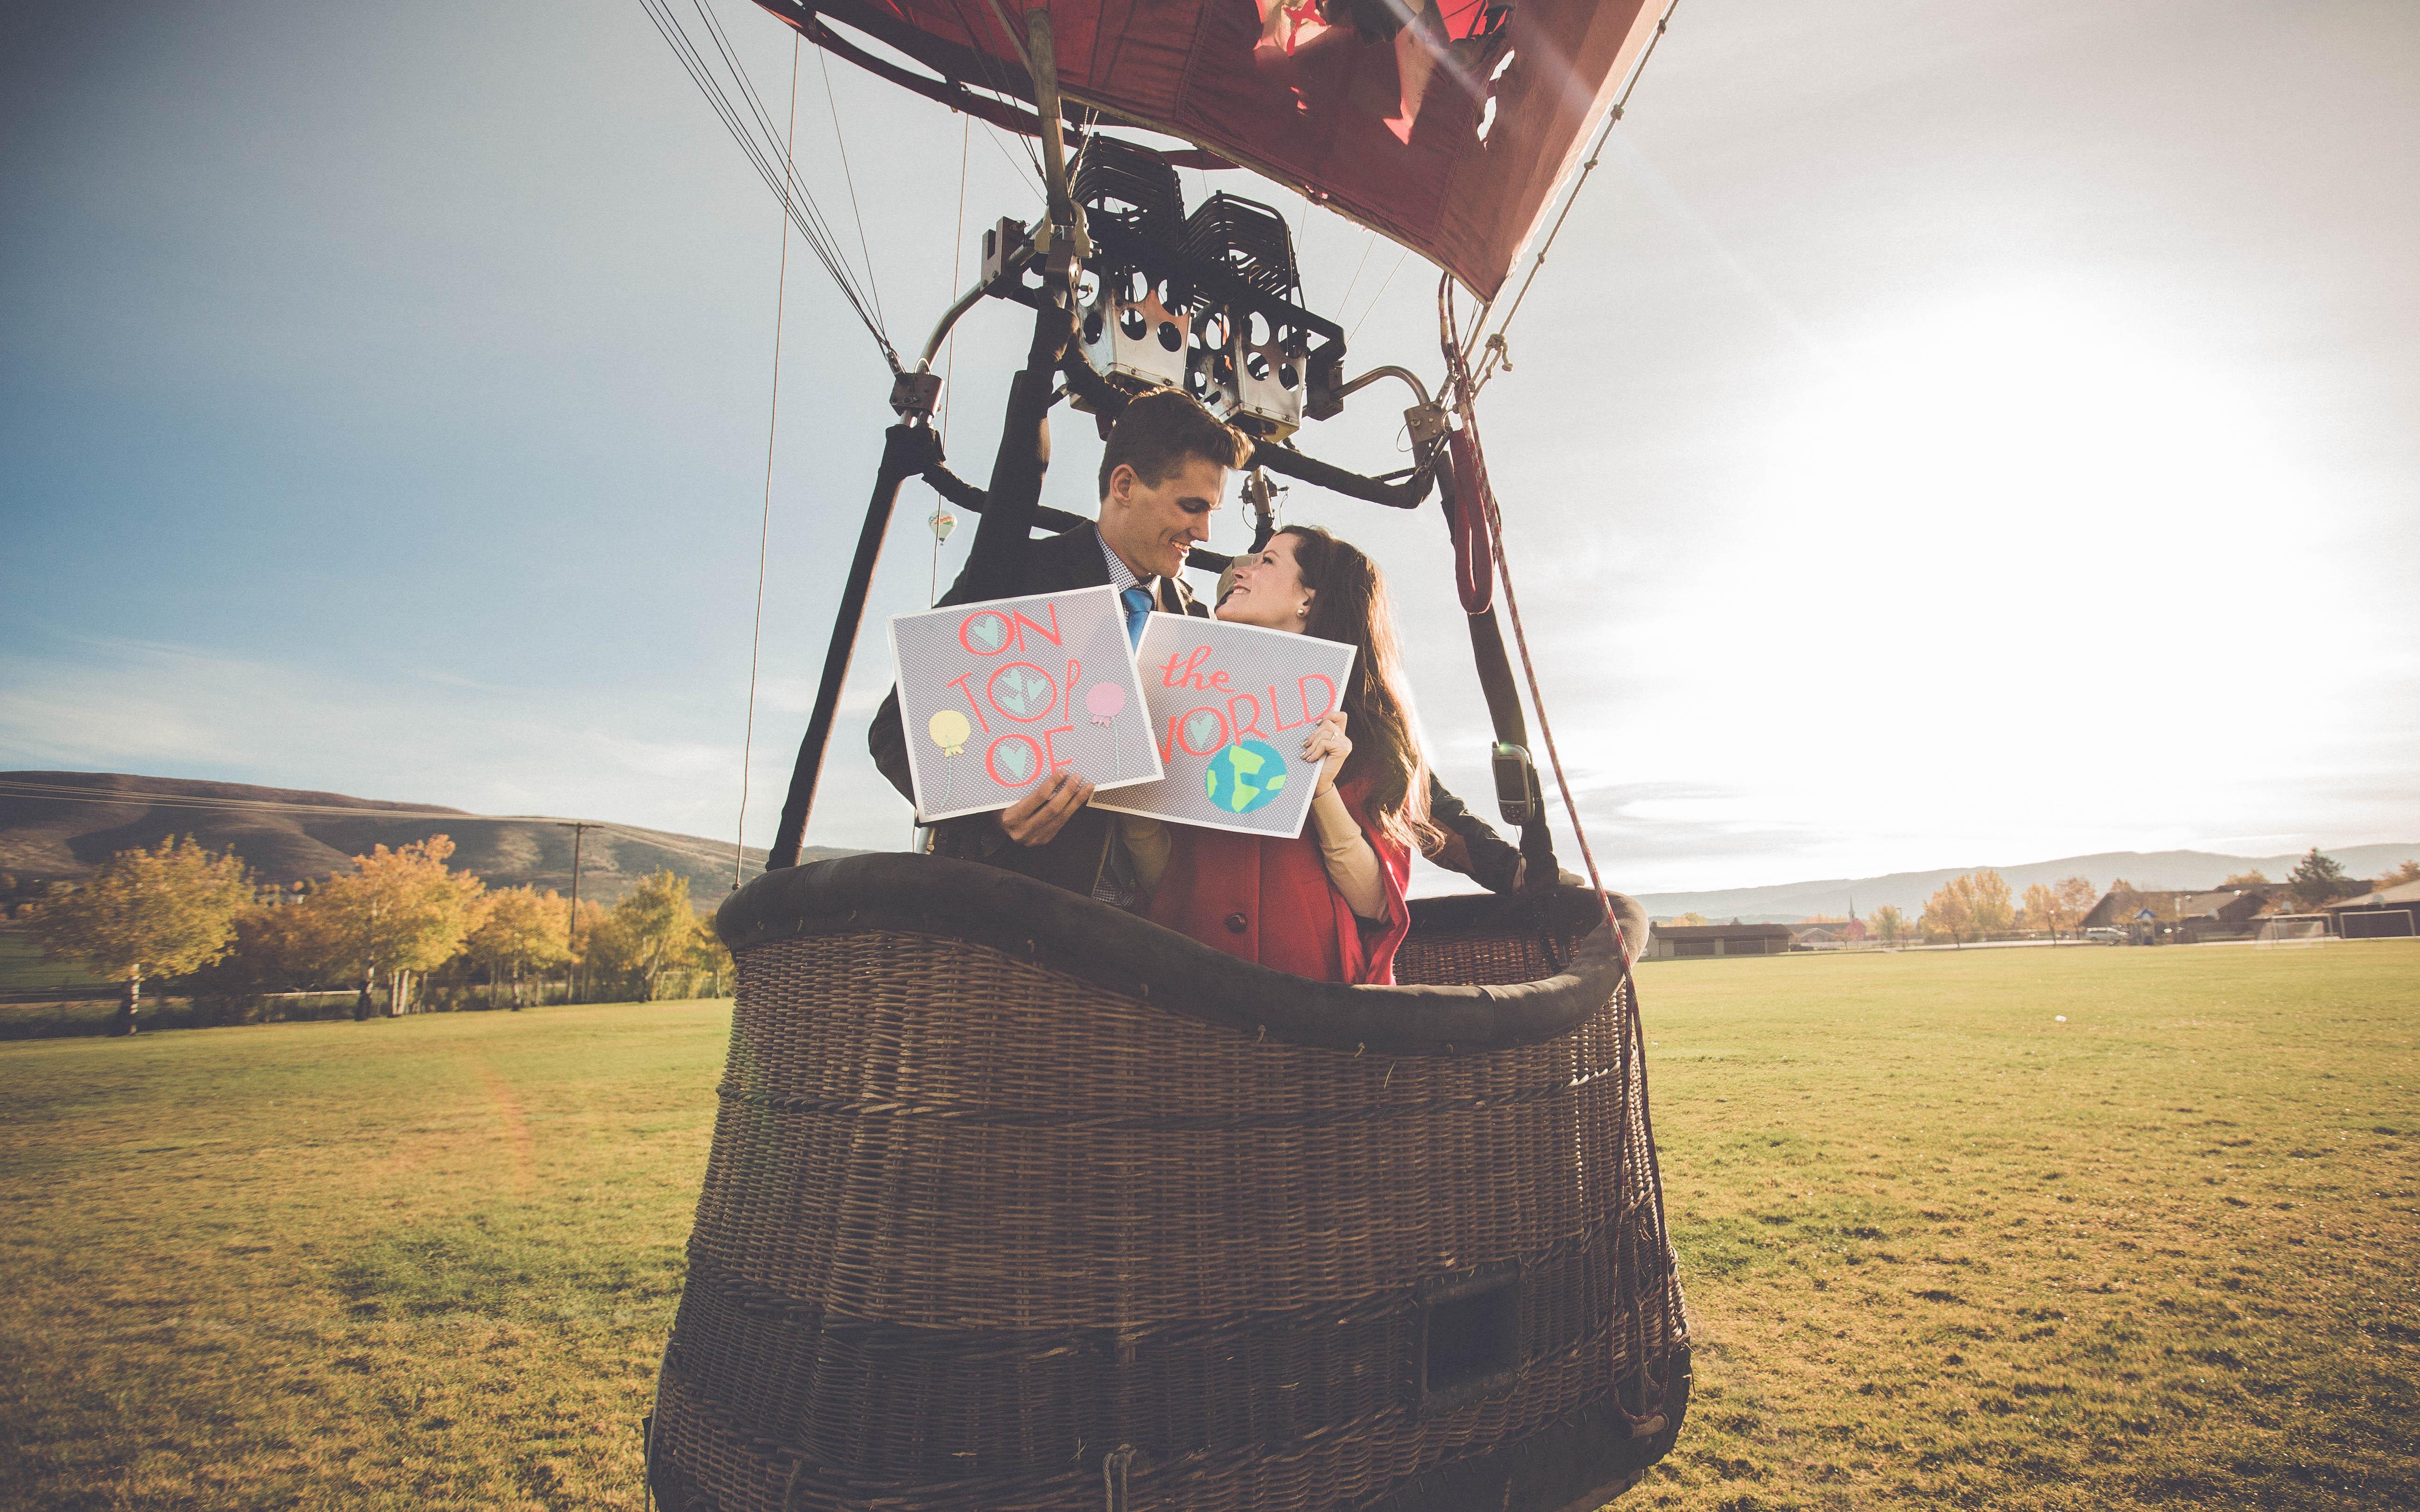 Hot Air Balloon Proposal Video